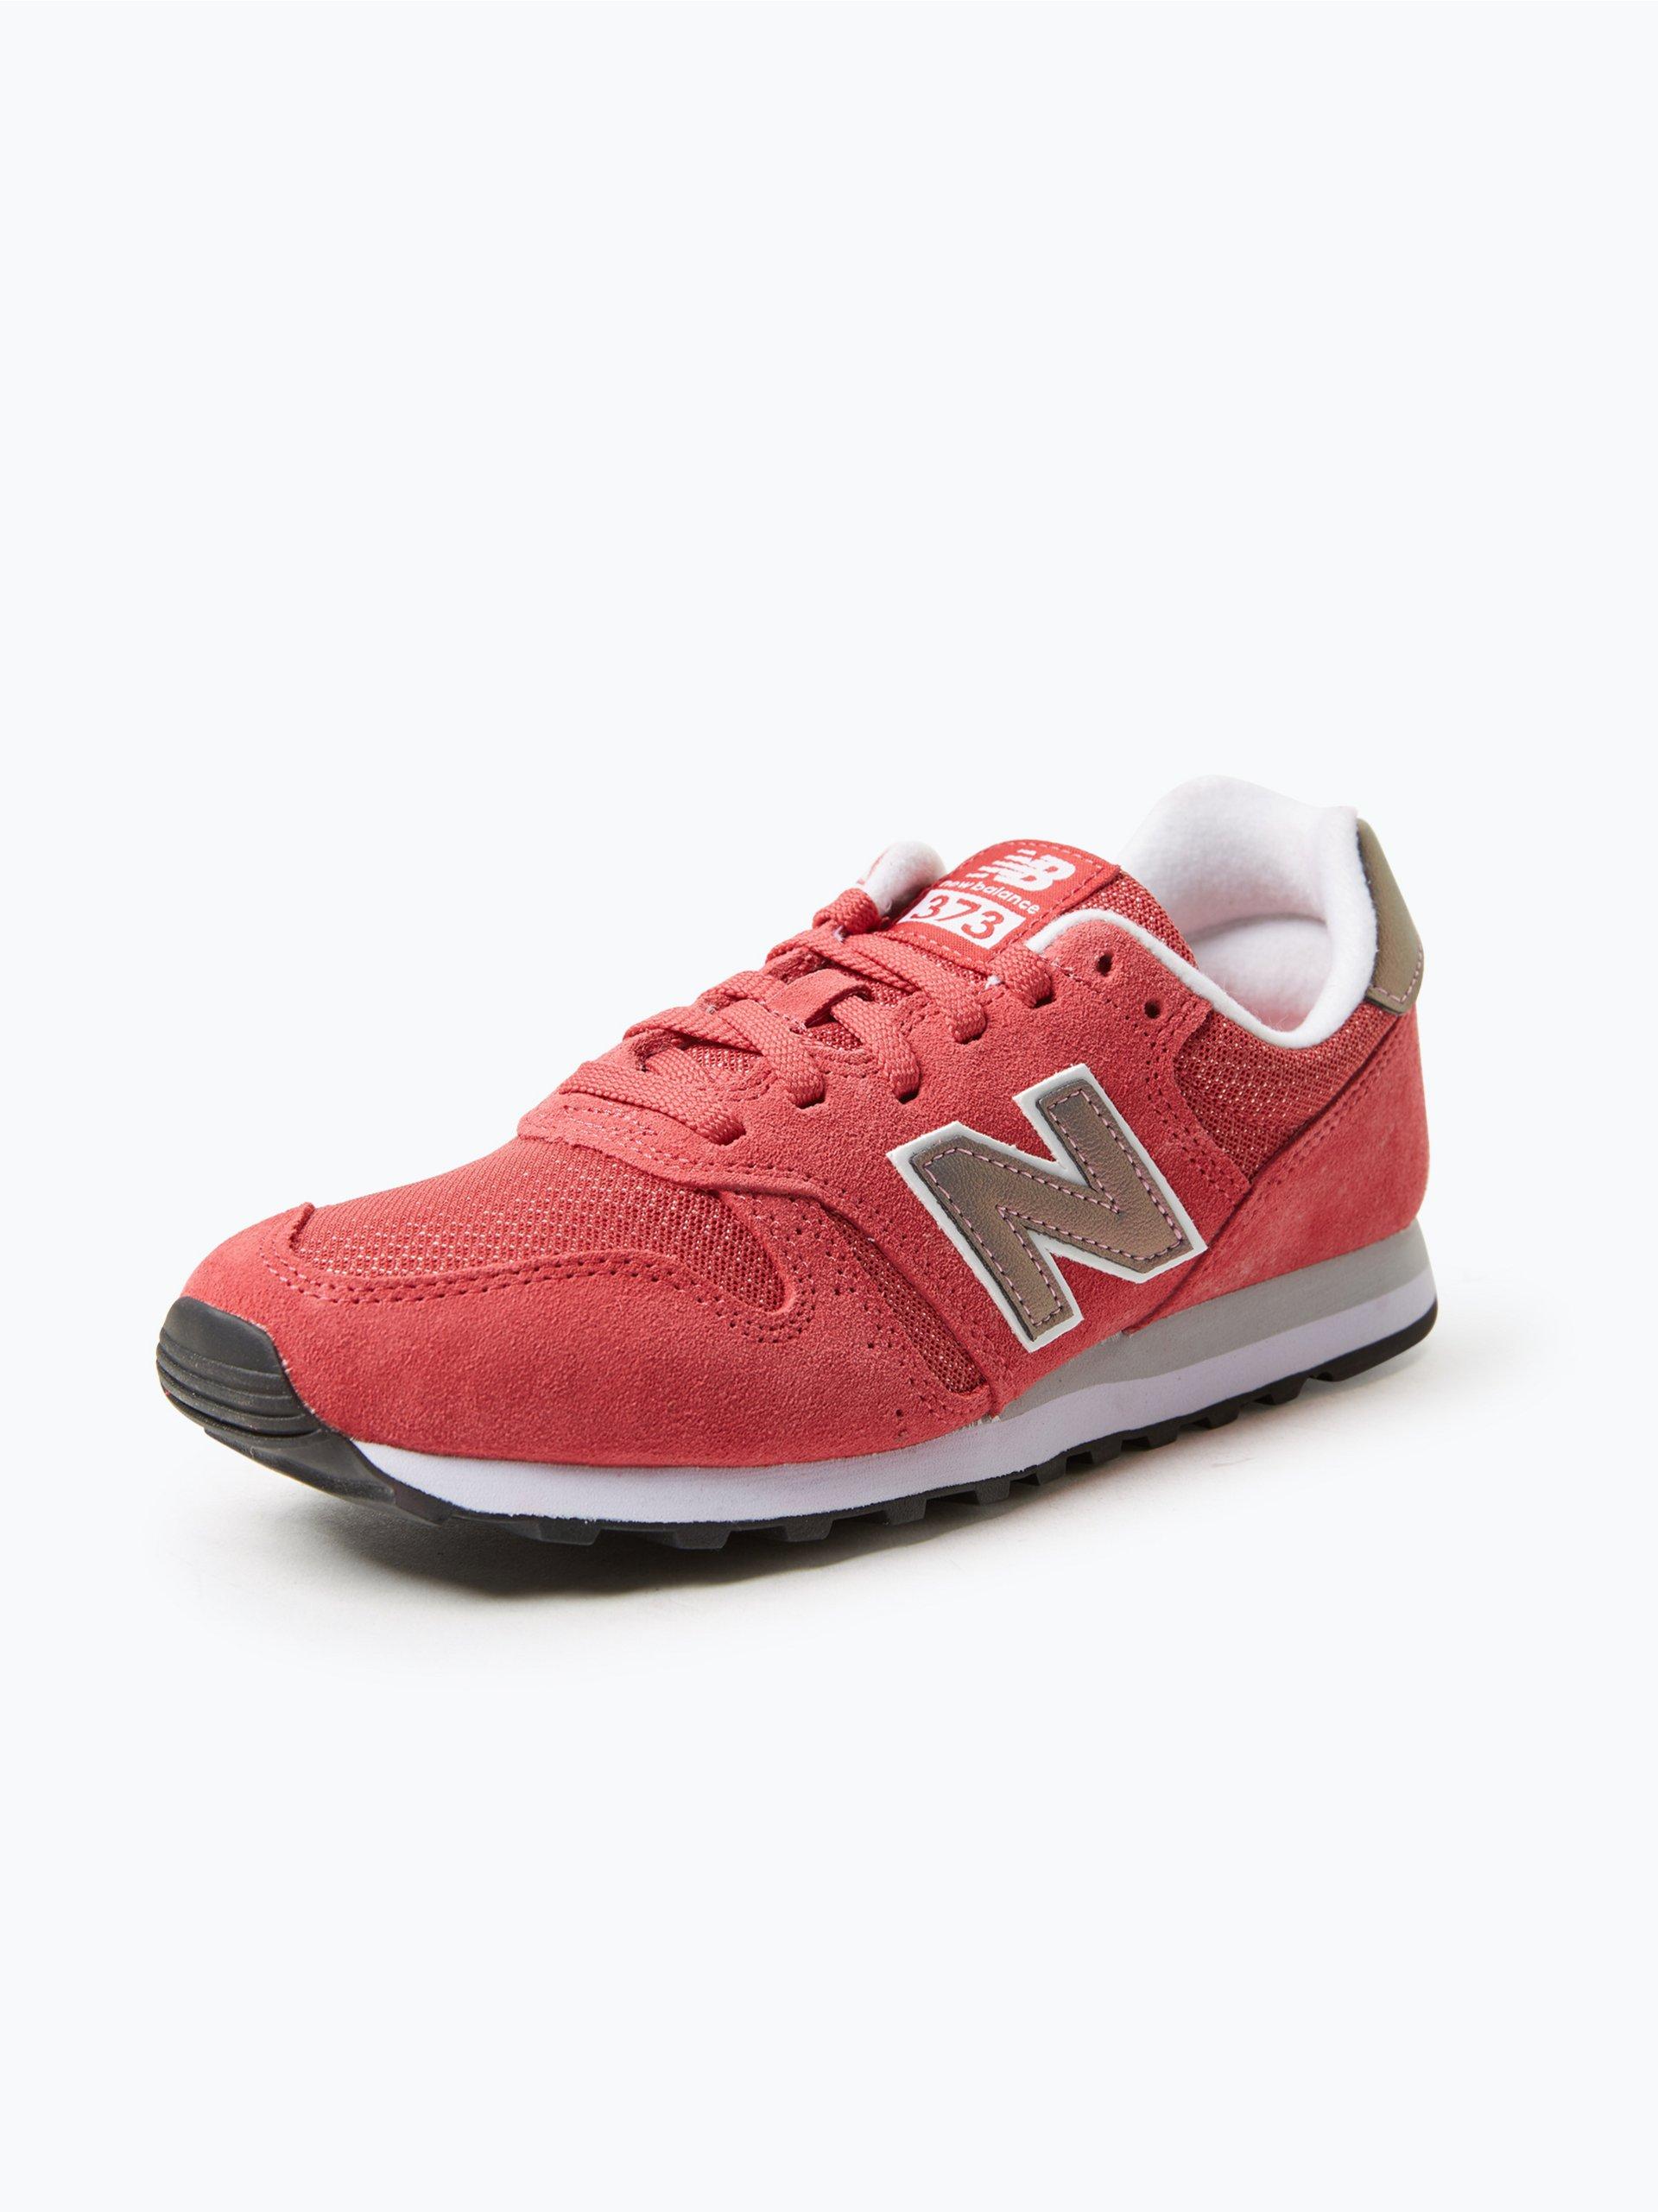 New Balance Damen Sneaker mit Leder-Anteil